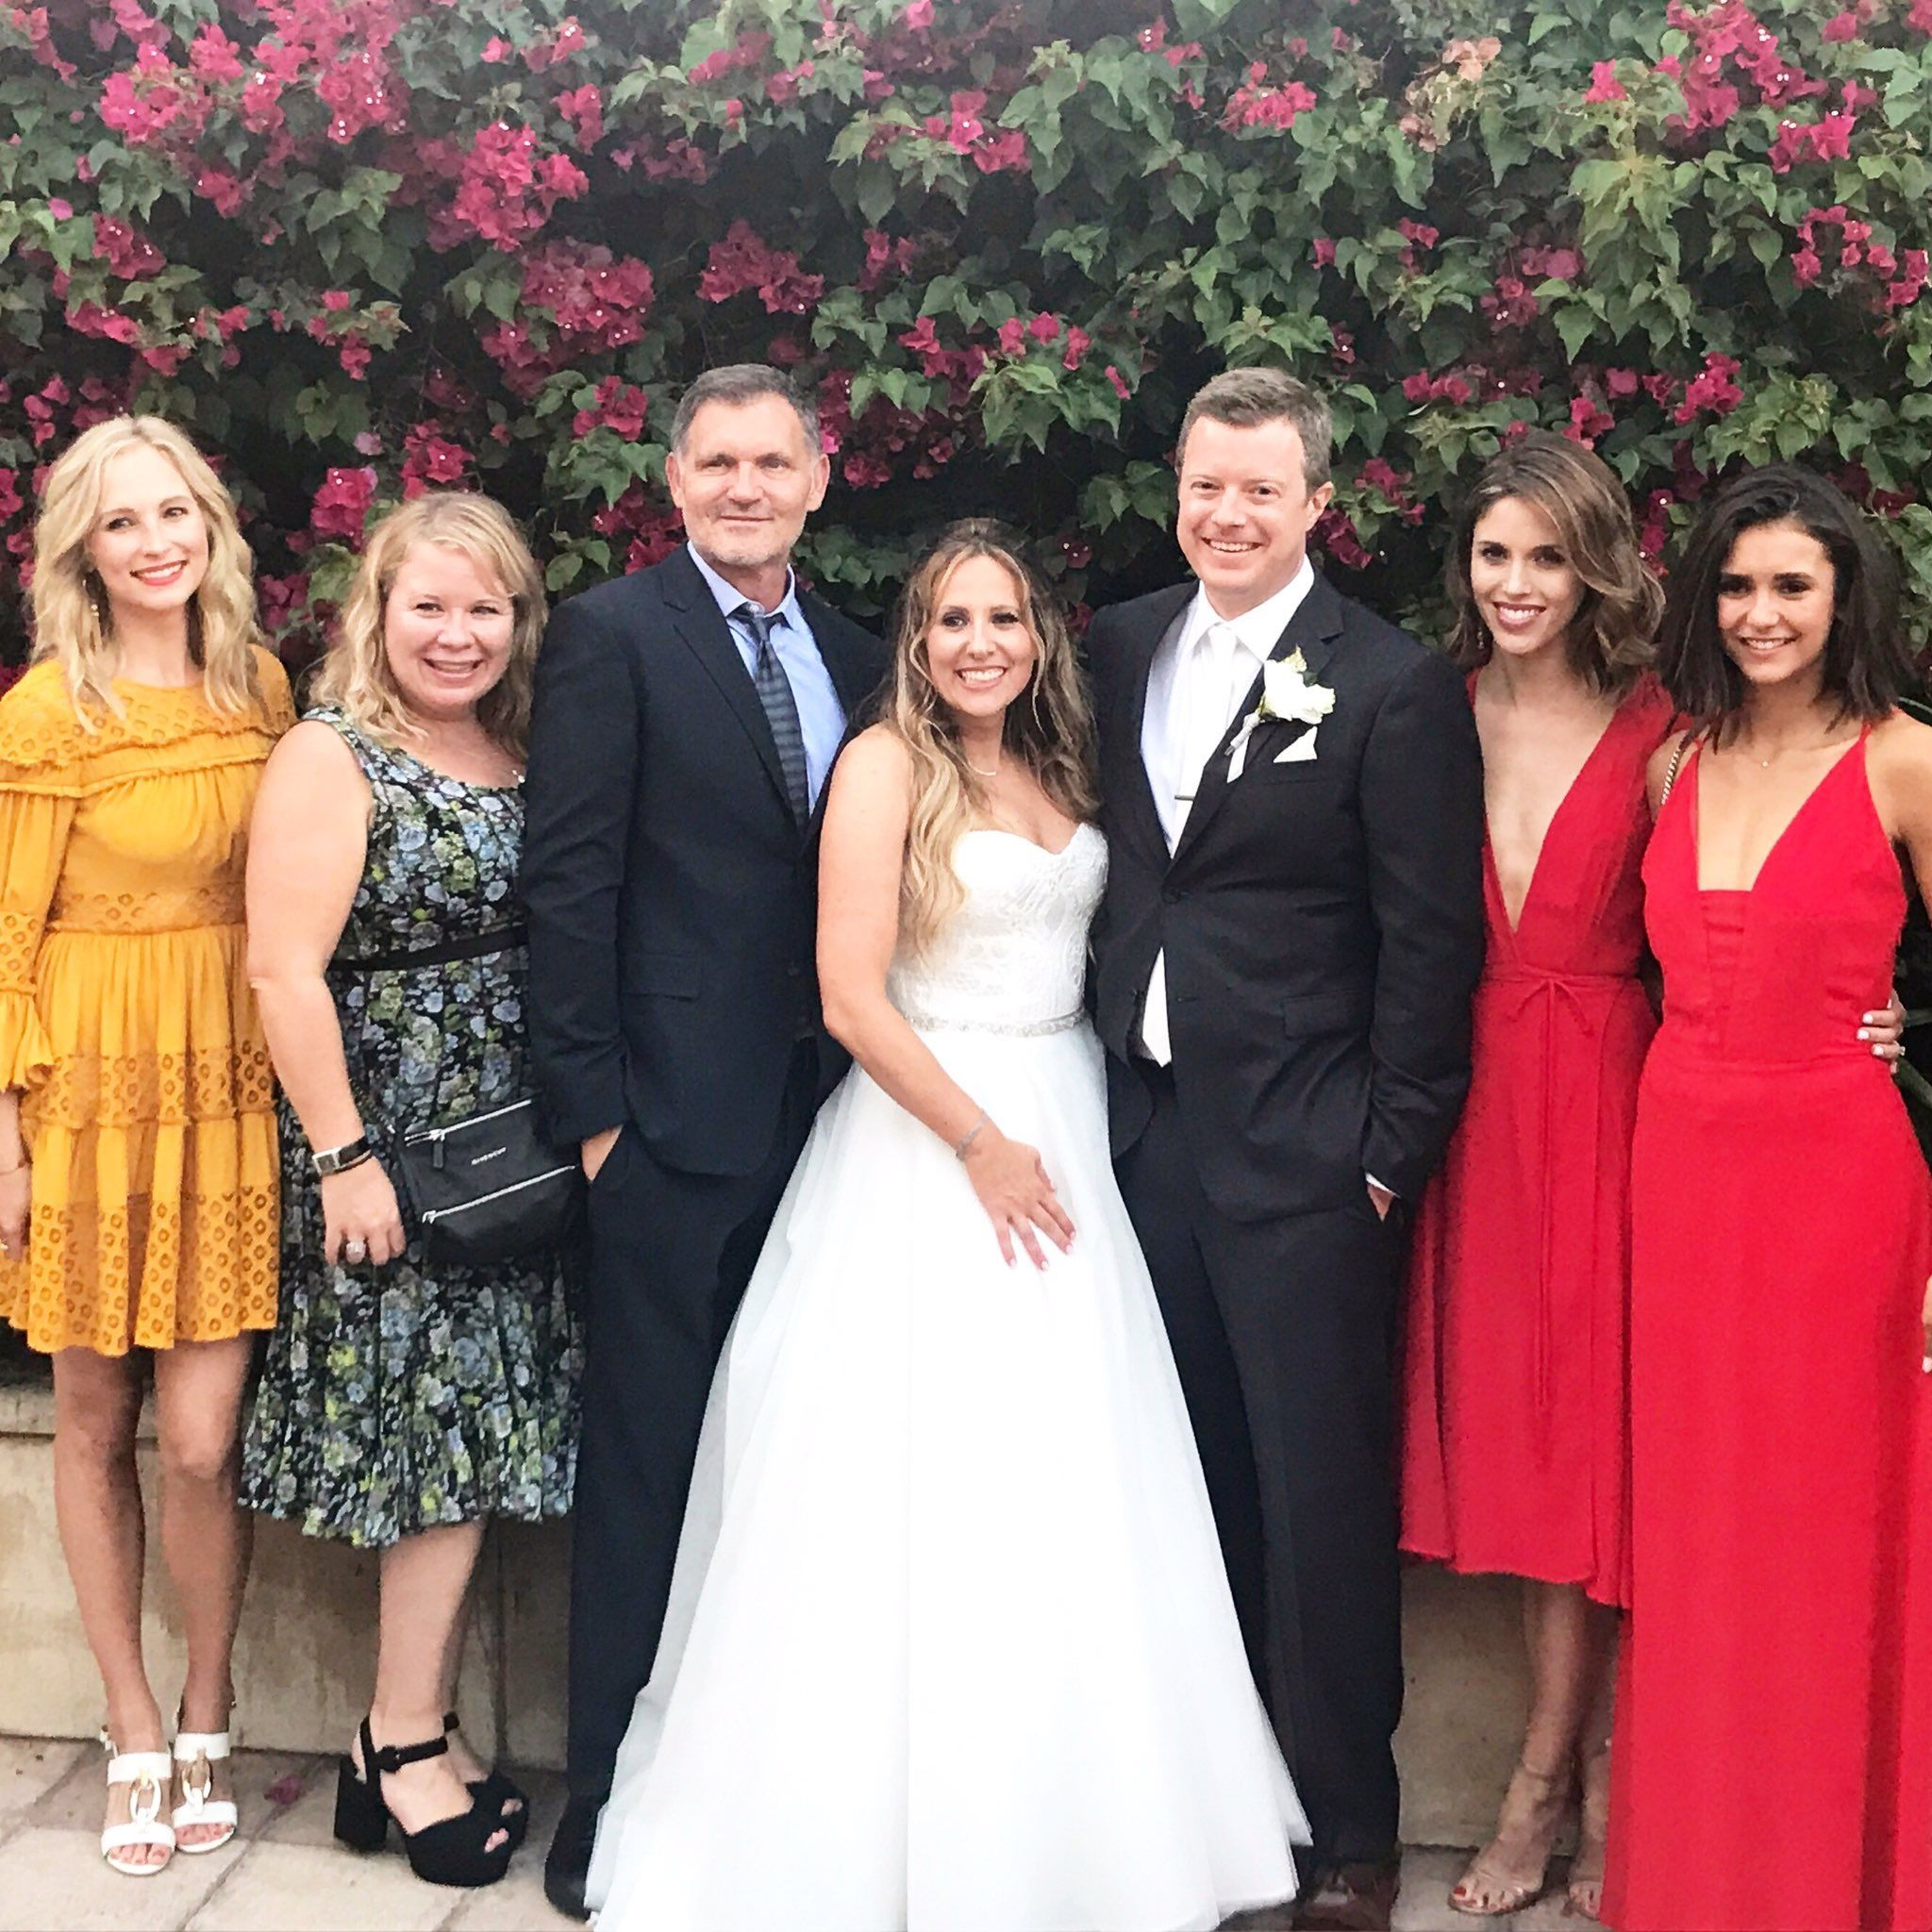 Candice Accola Nina Dobrev Vampire Diaries Cast Candice King Celebs